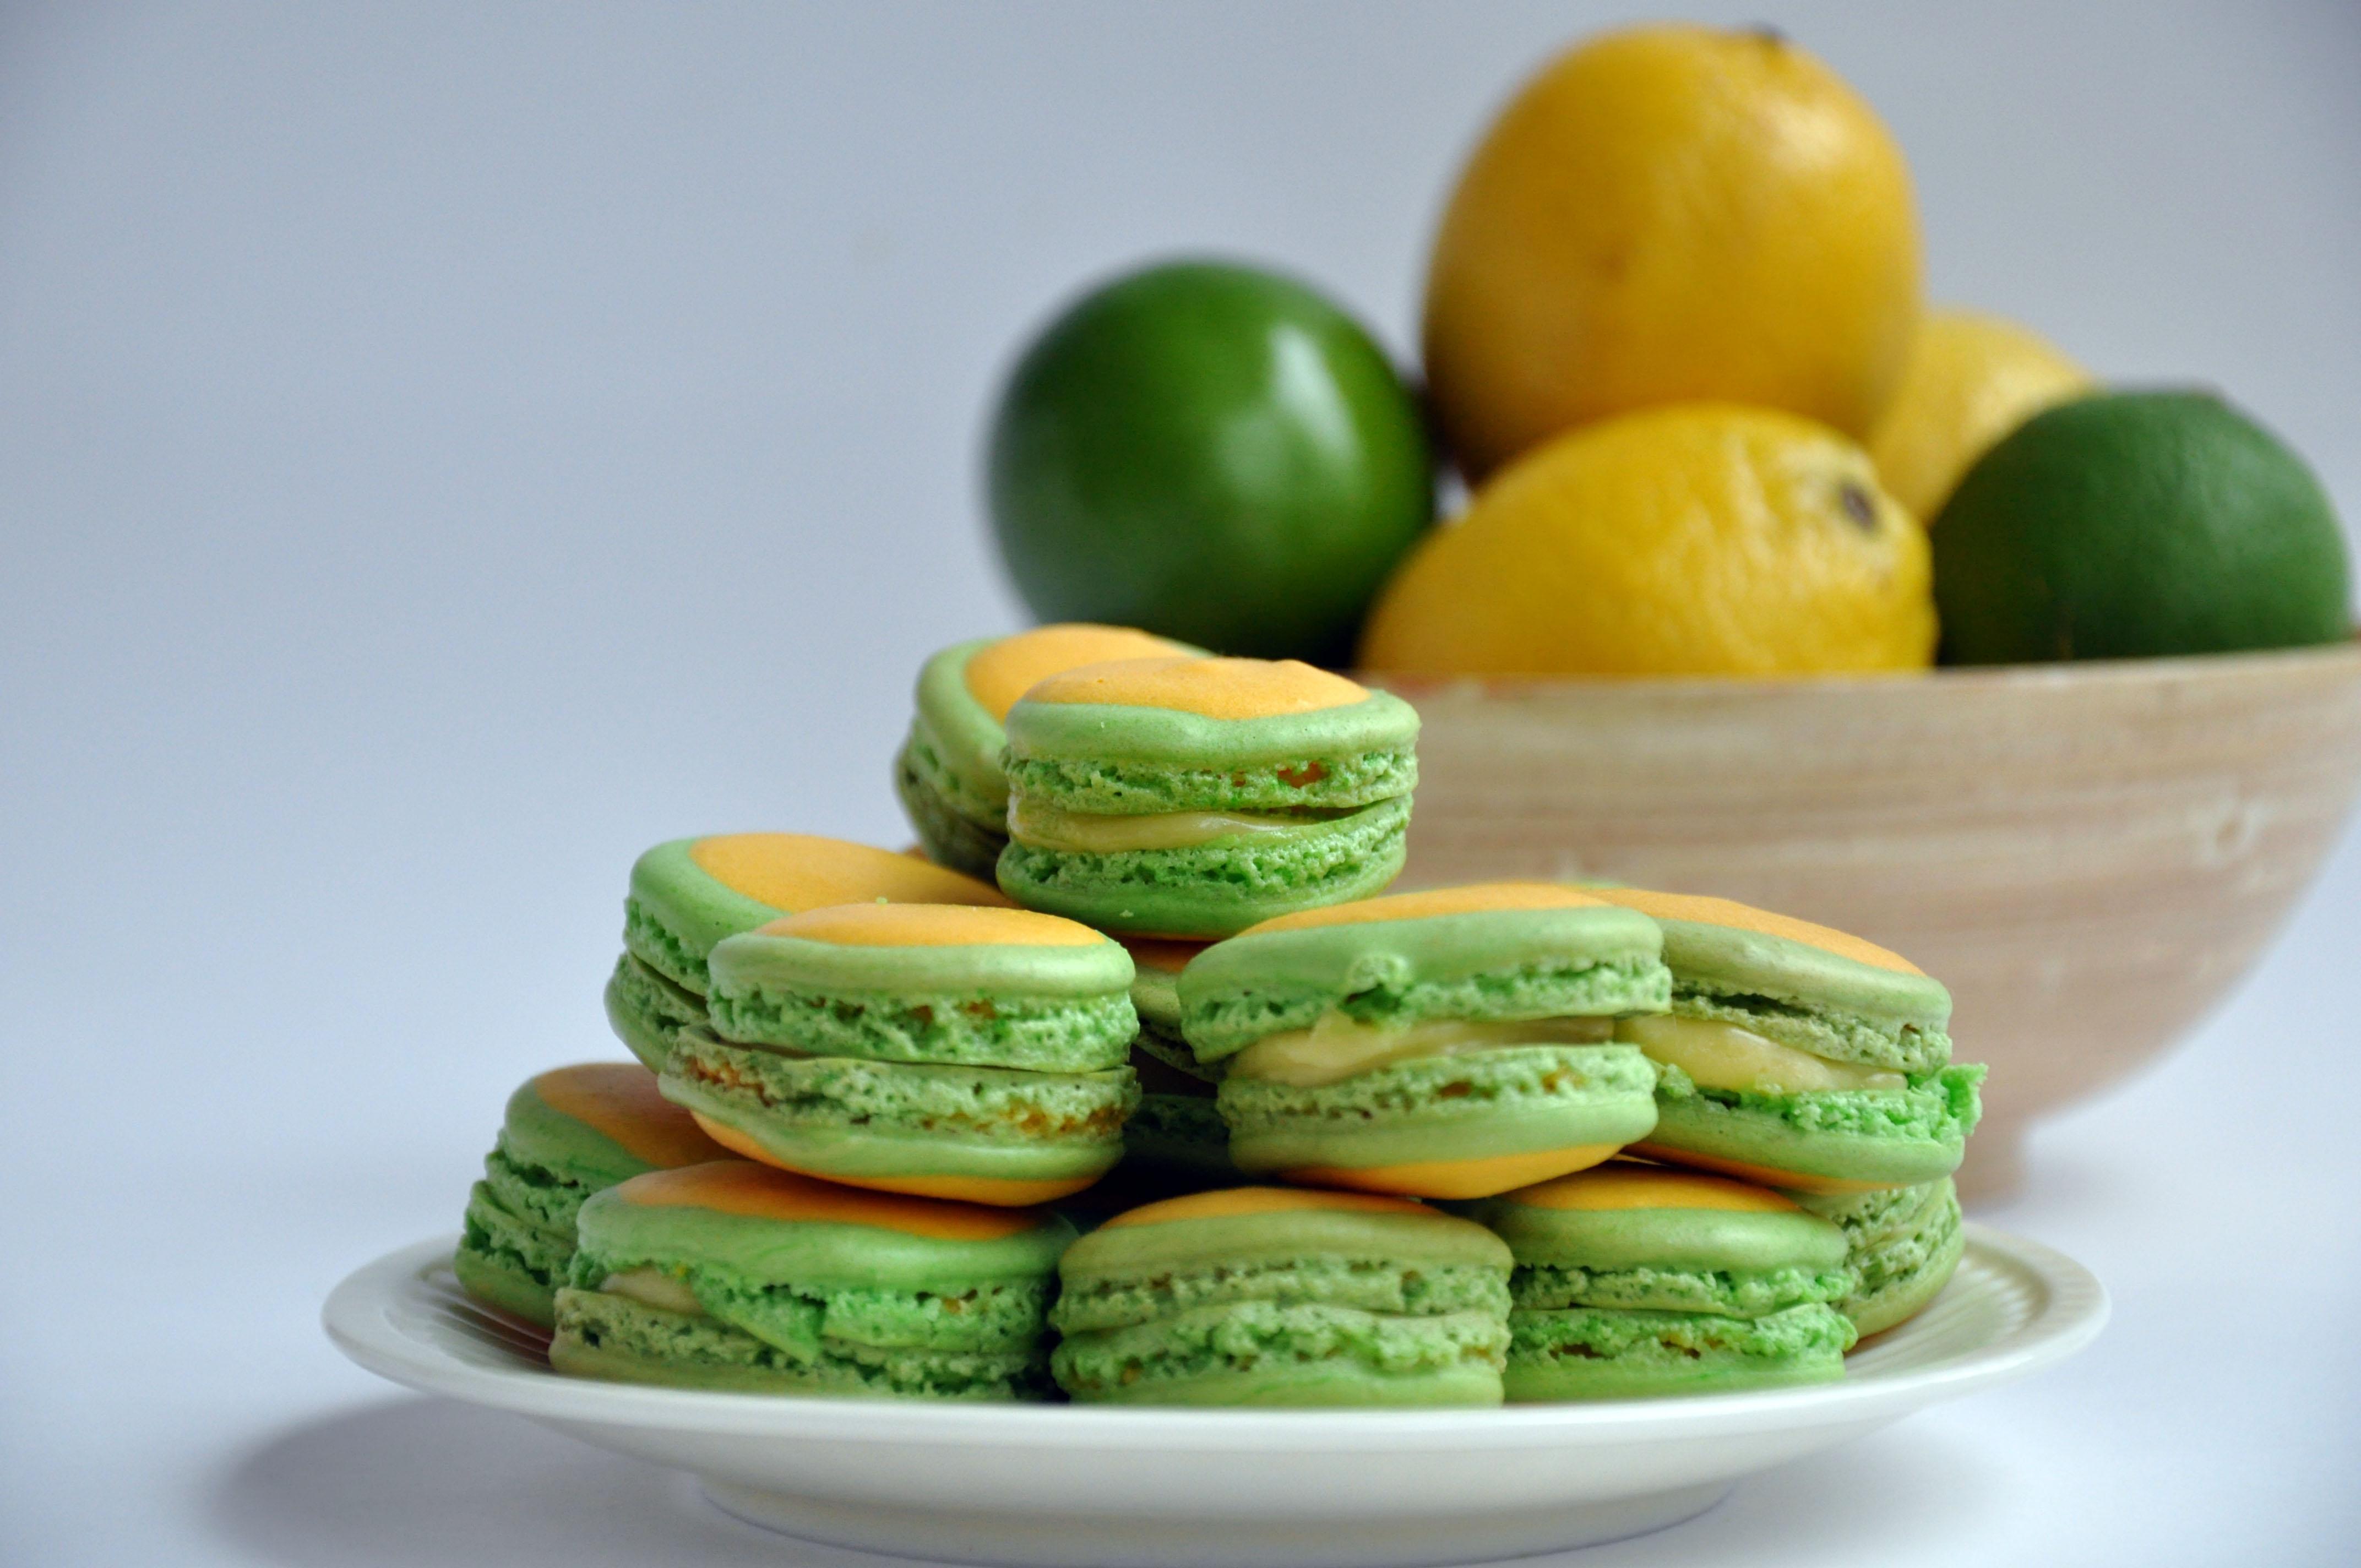 Lemon Lime Macarons With Lemon Lime Curd Of Course!